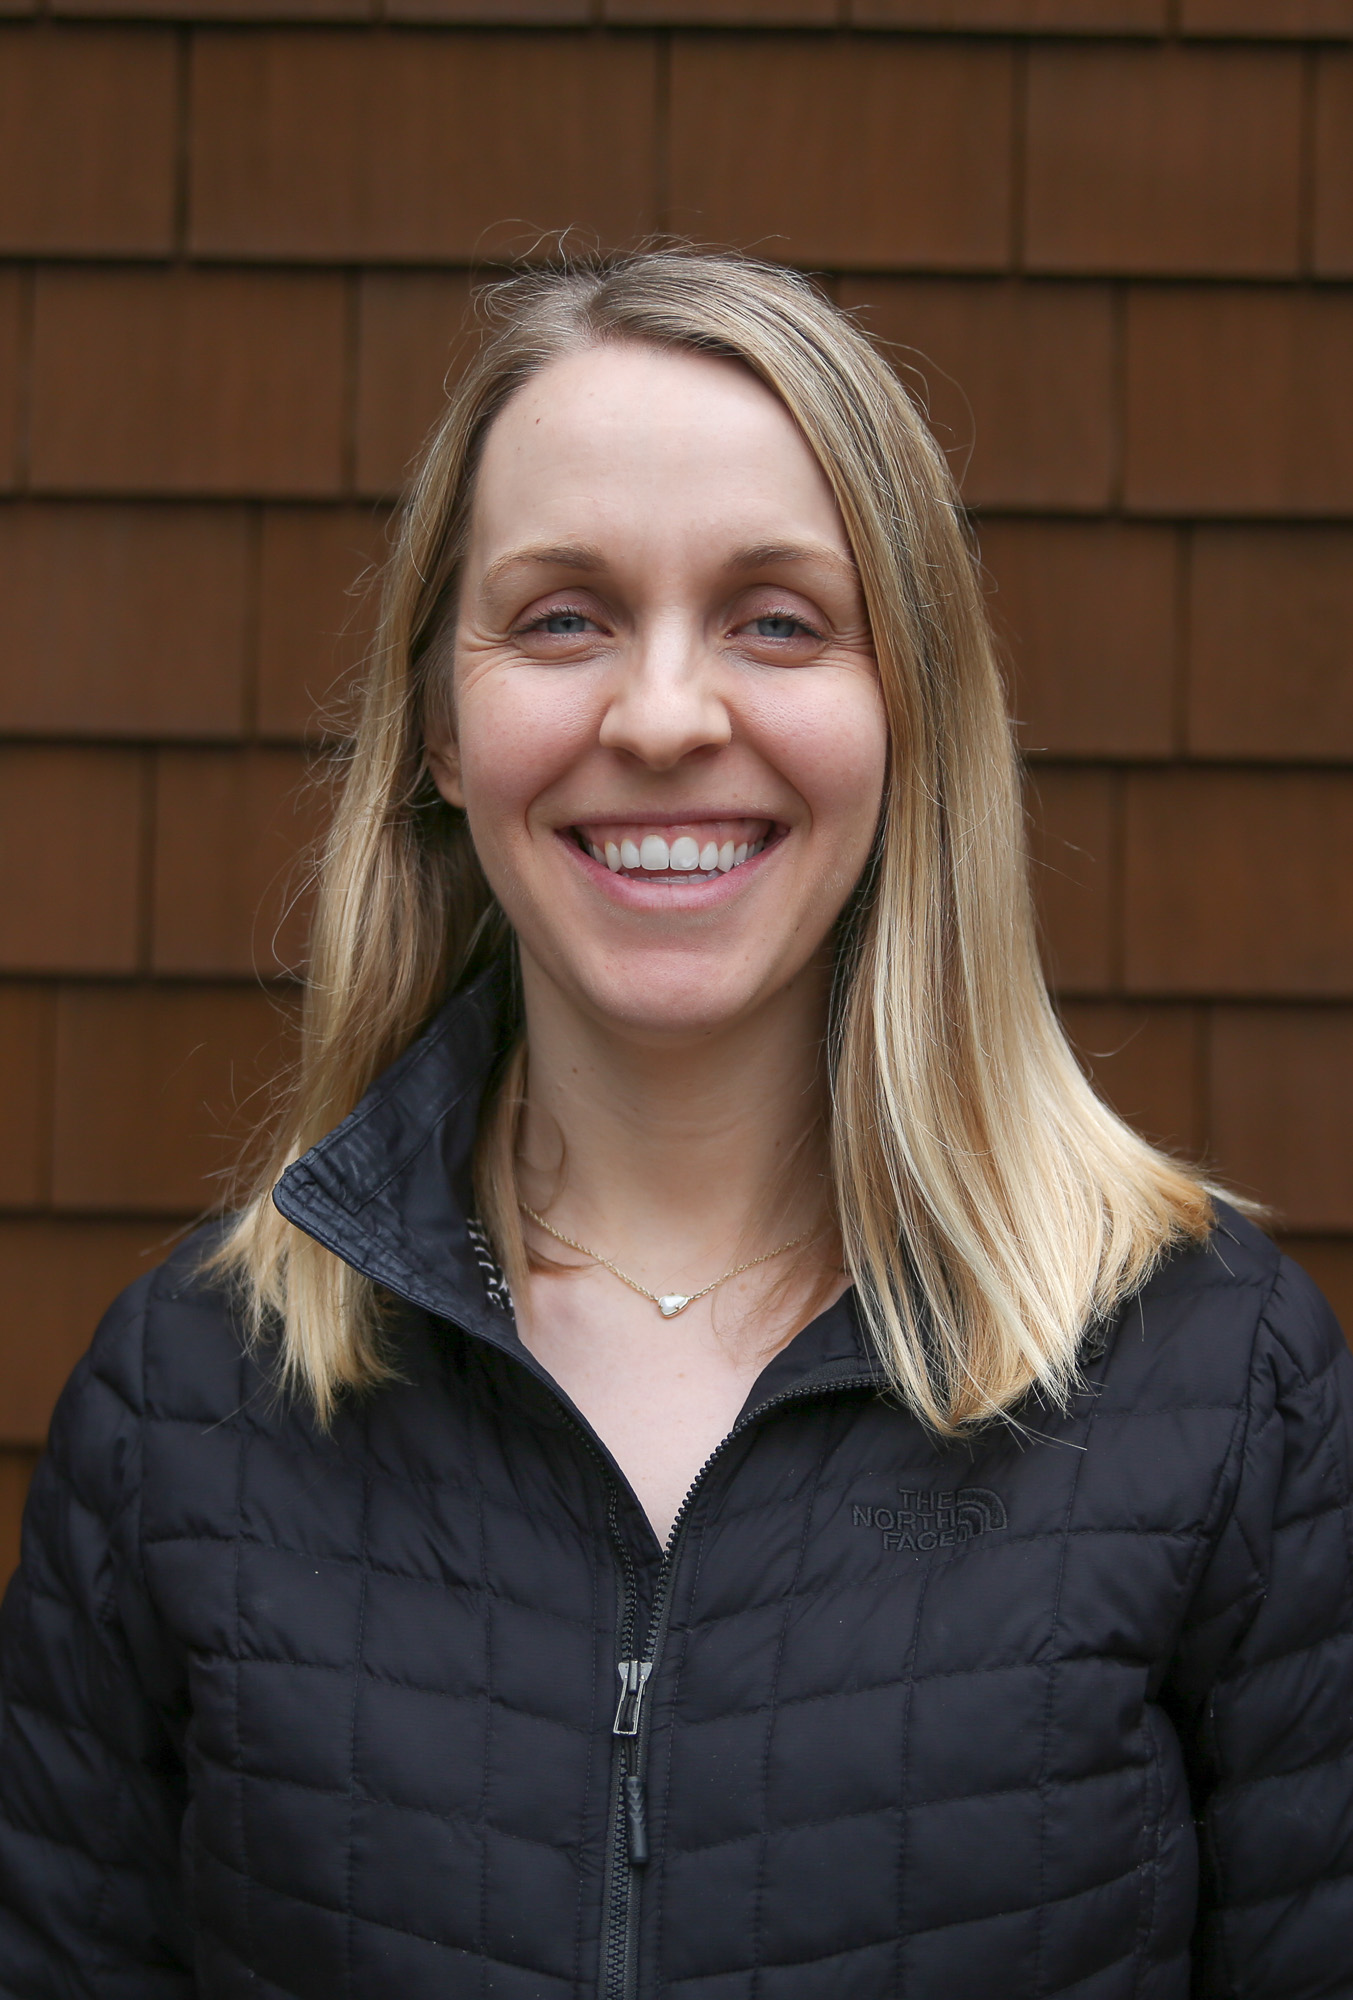 Liz Hayman, School Counselor, 1 year at MTS